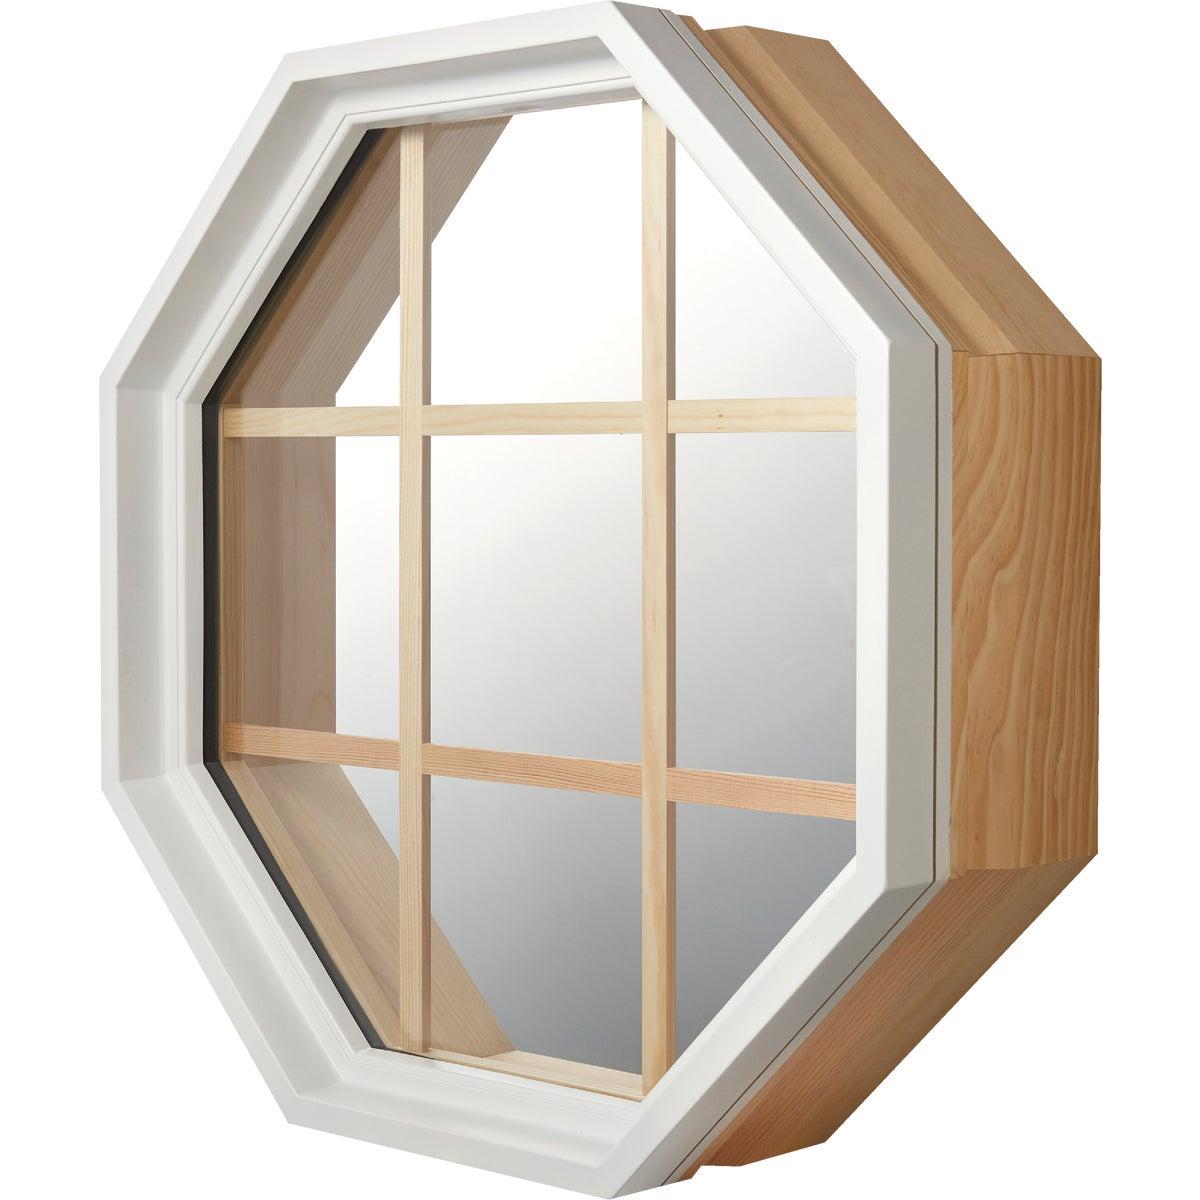 Wht Vnyl Octagon Window